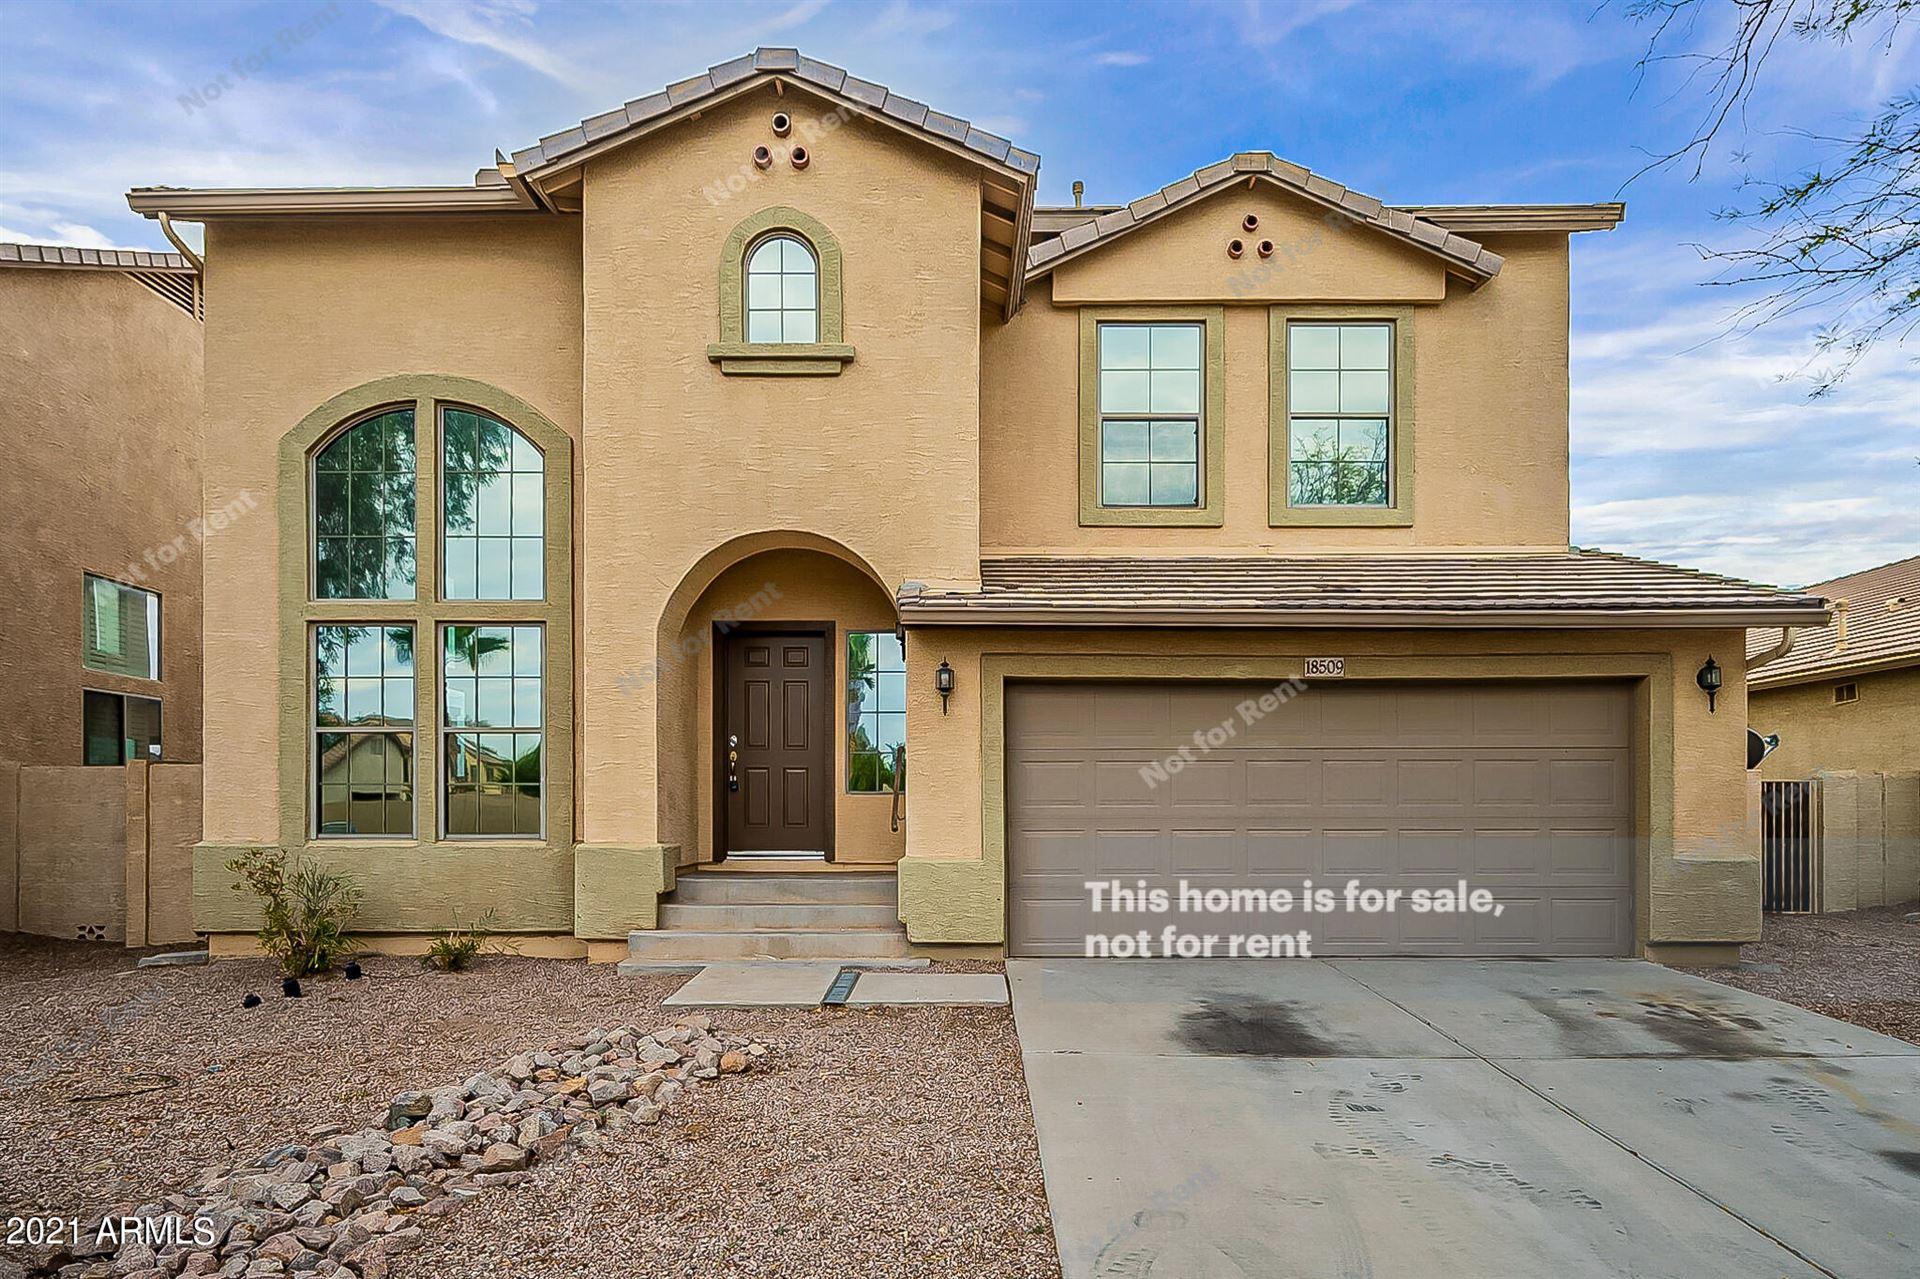 Photo for 18509 N LARKSPUR Drive, Maricopa, AZ 85138 (MLS # 6260578)